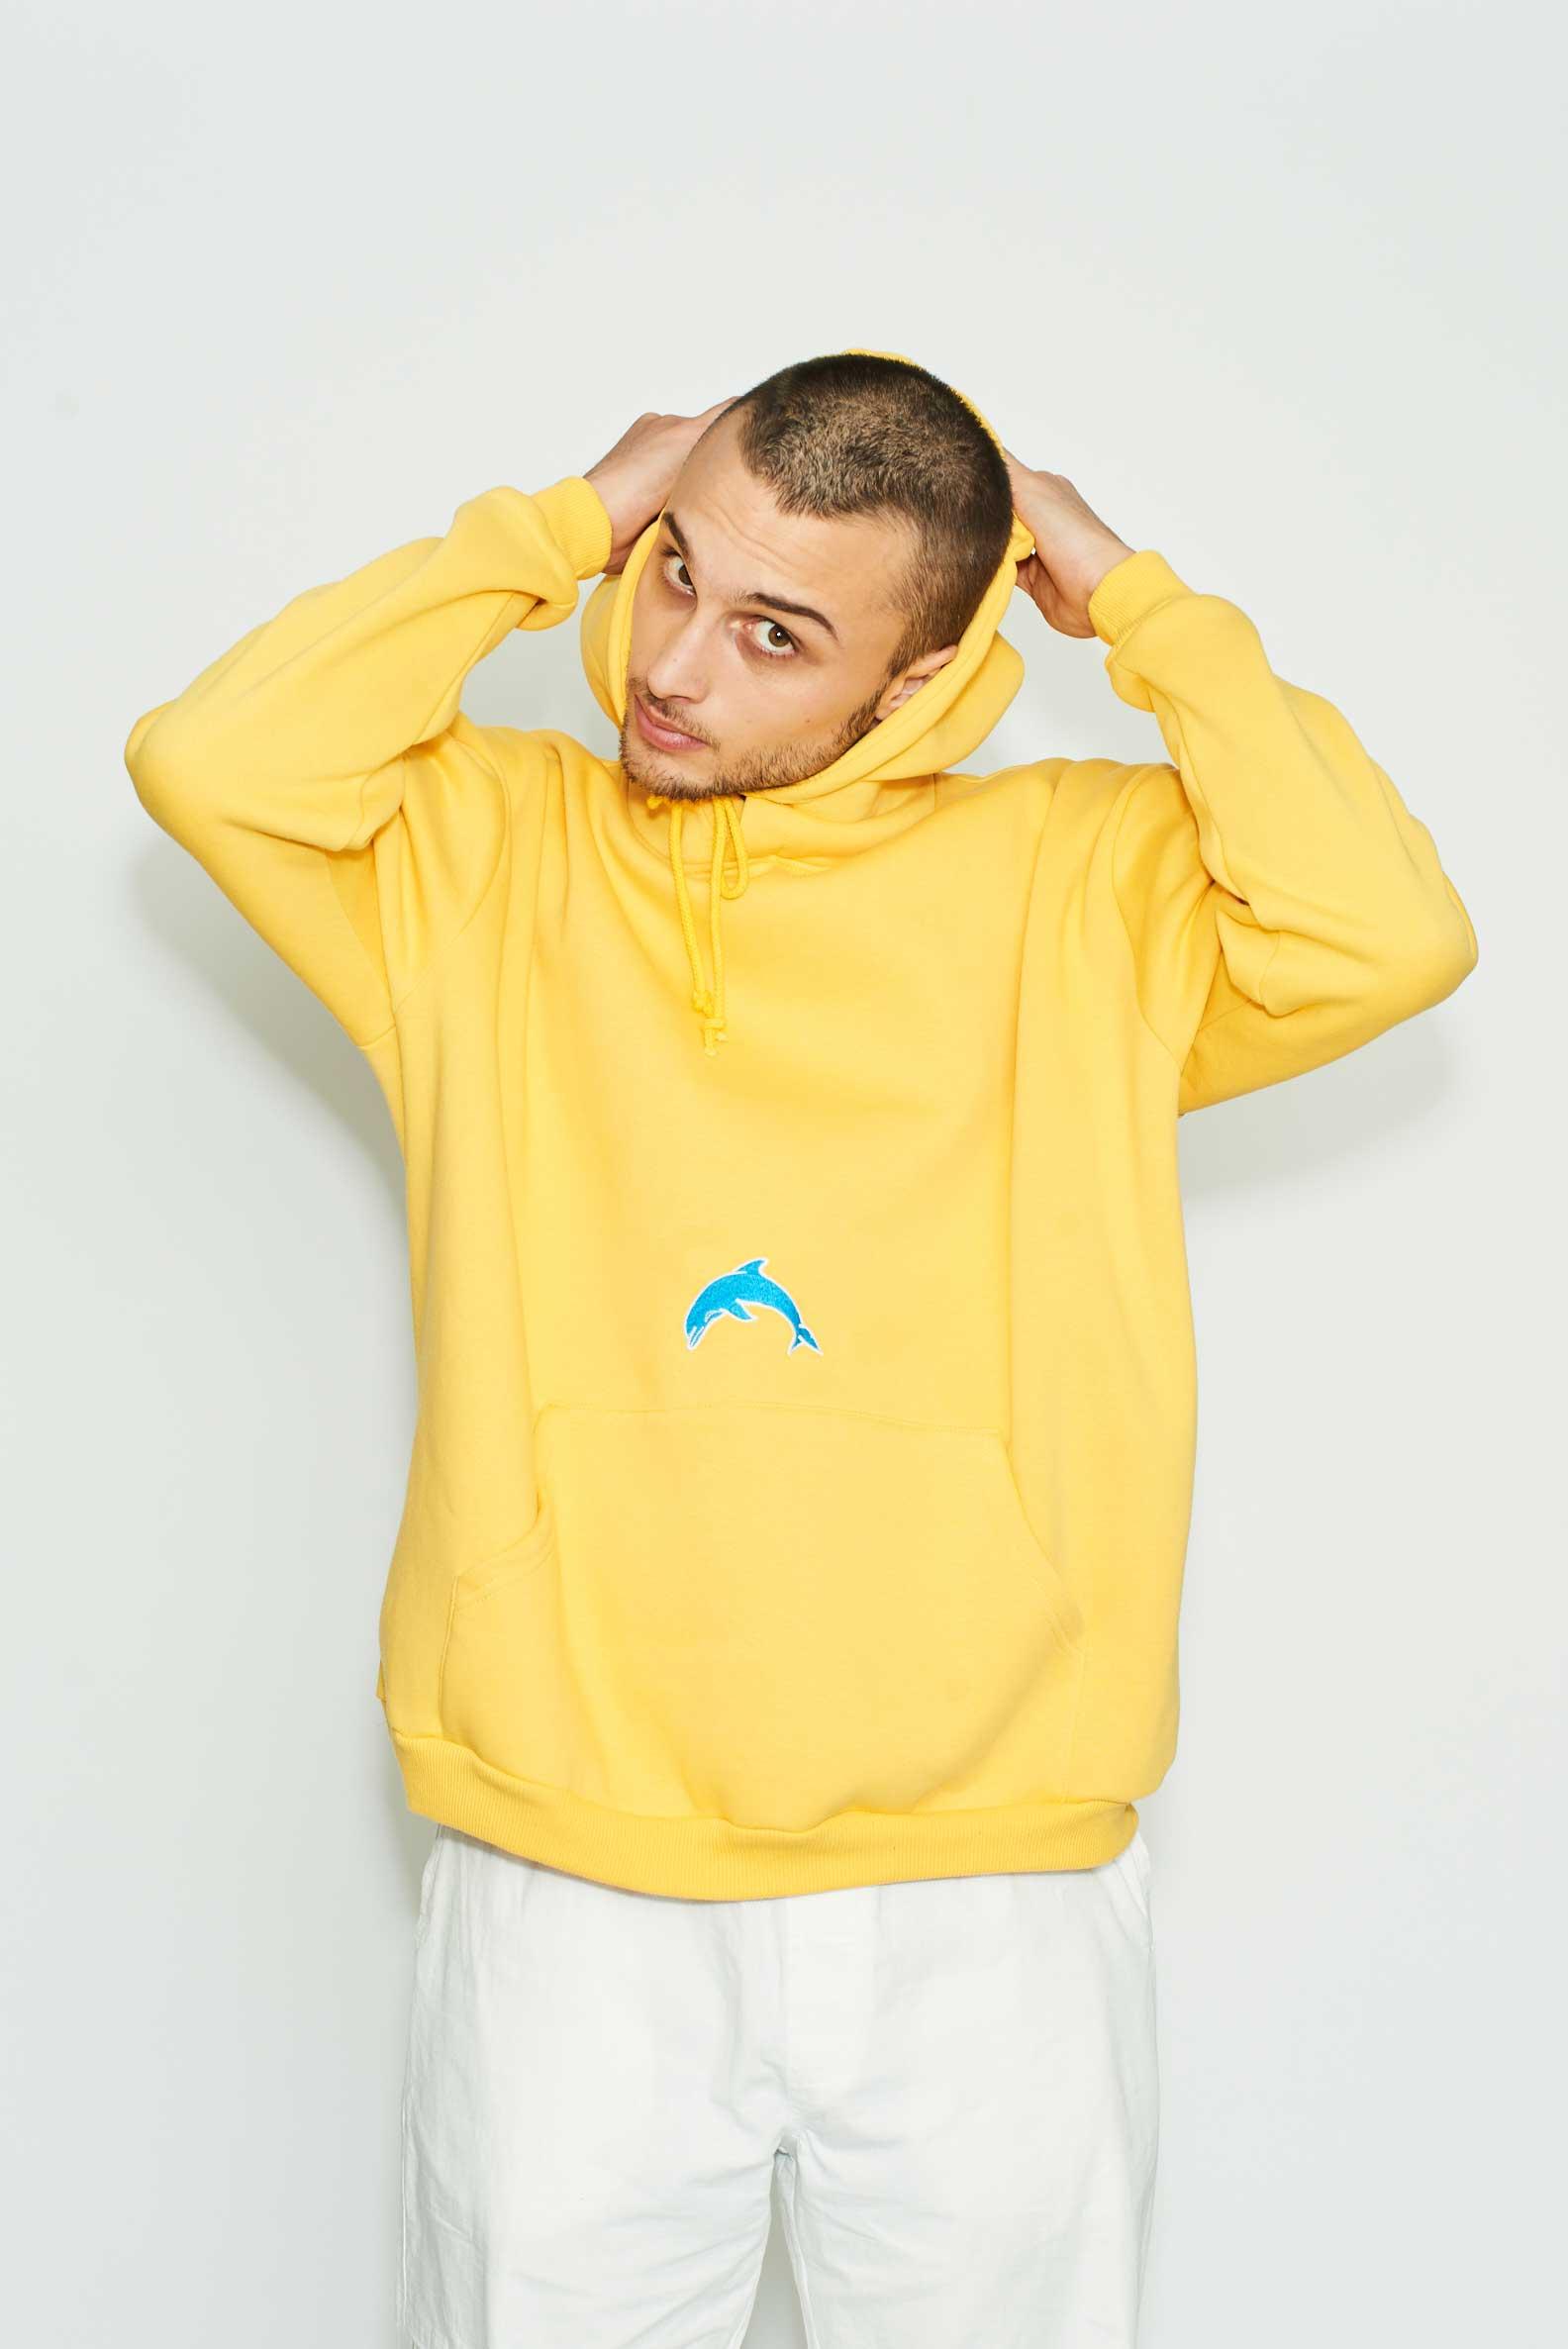 Herotic - Dolphin Hoodie - Yellow